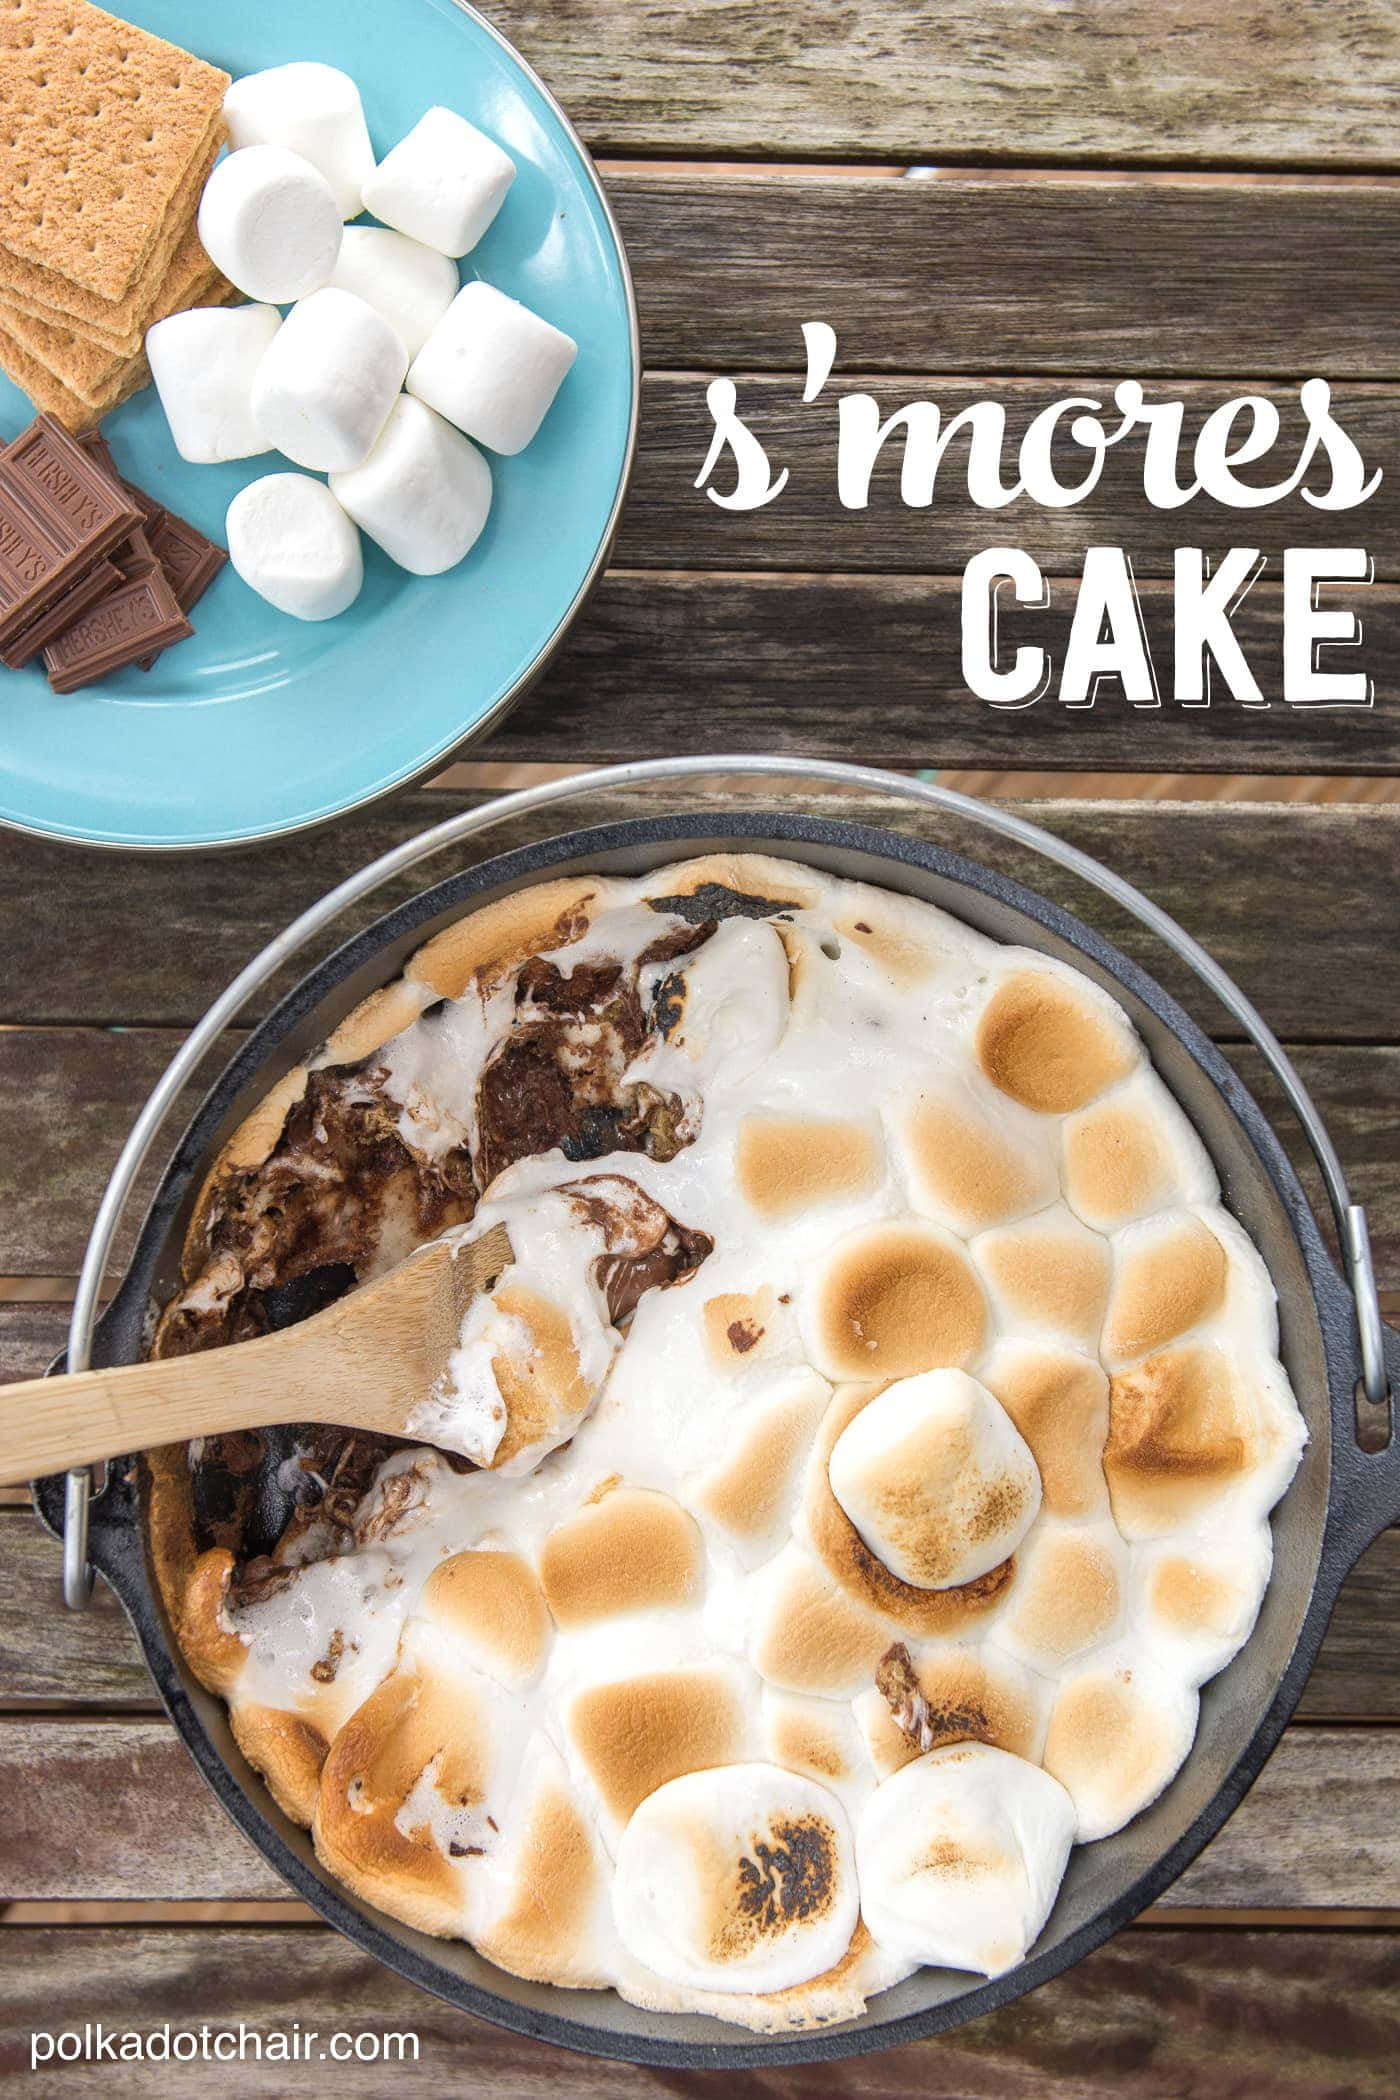 Super easy recipe for S'mores cake!